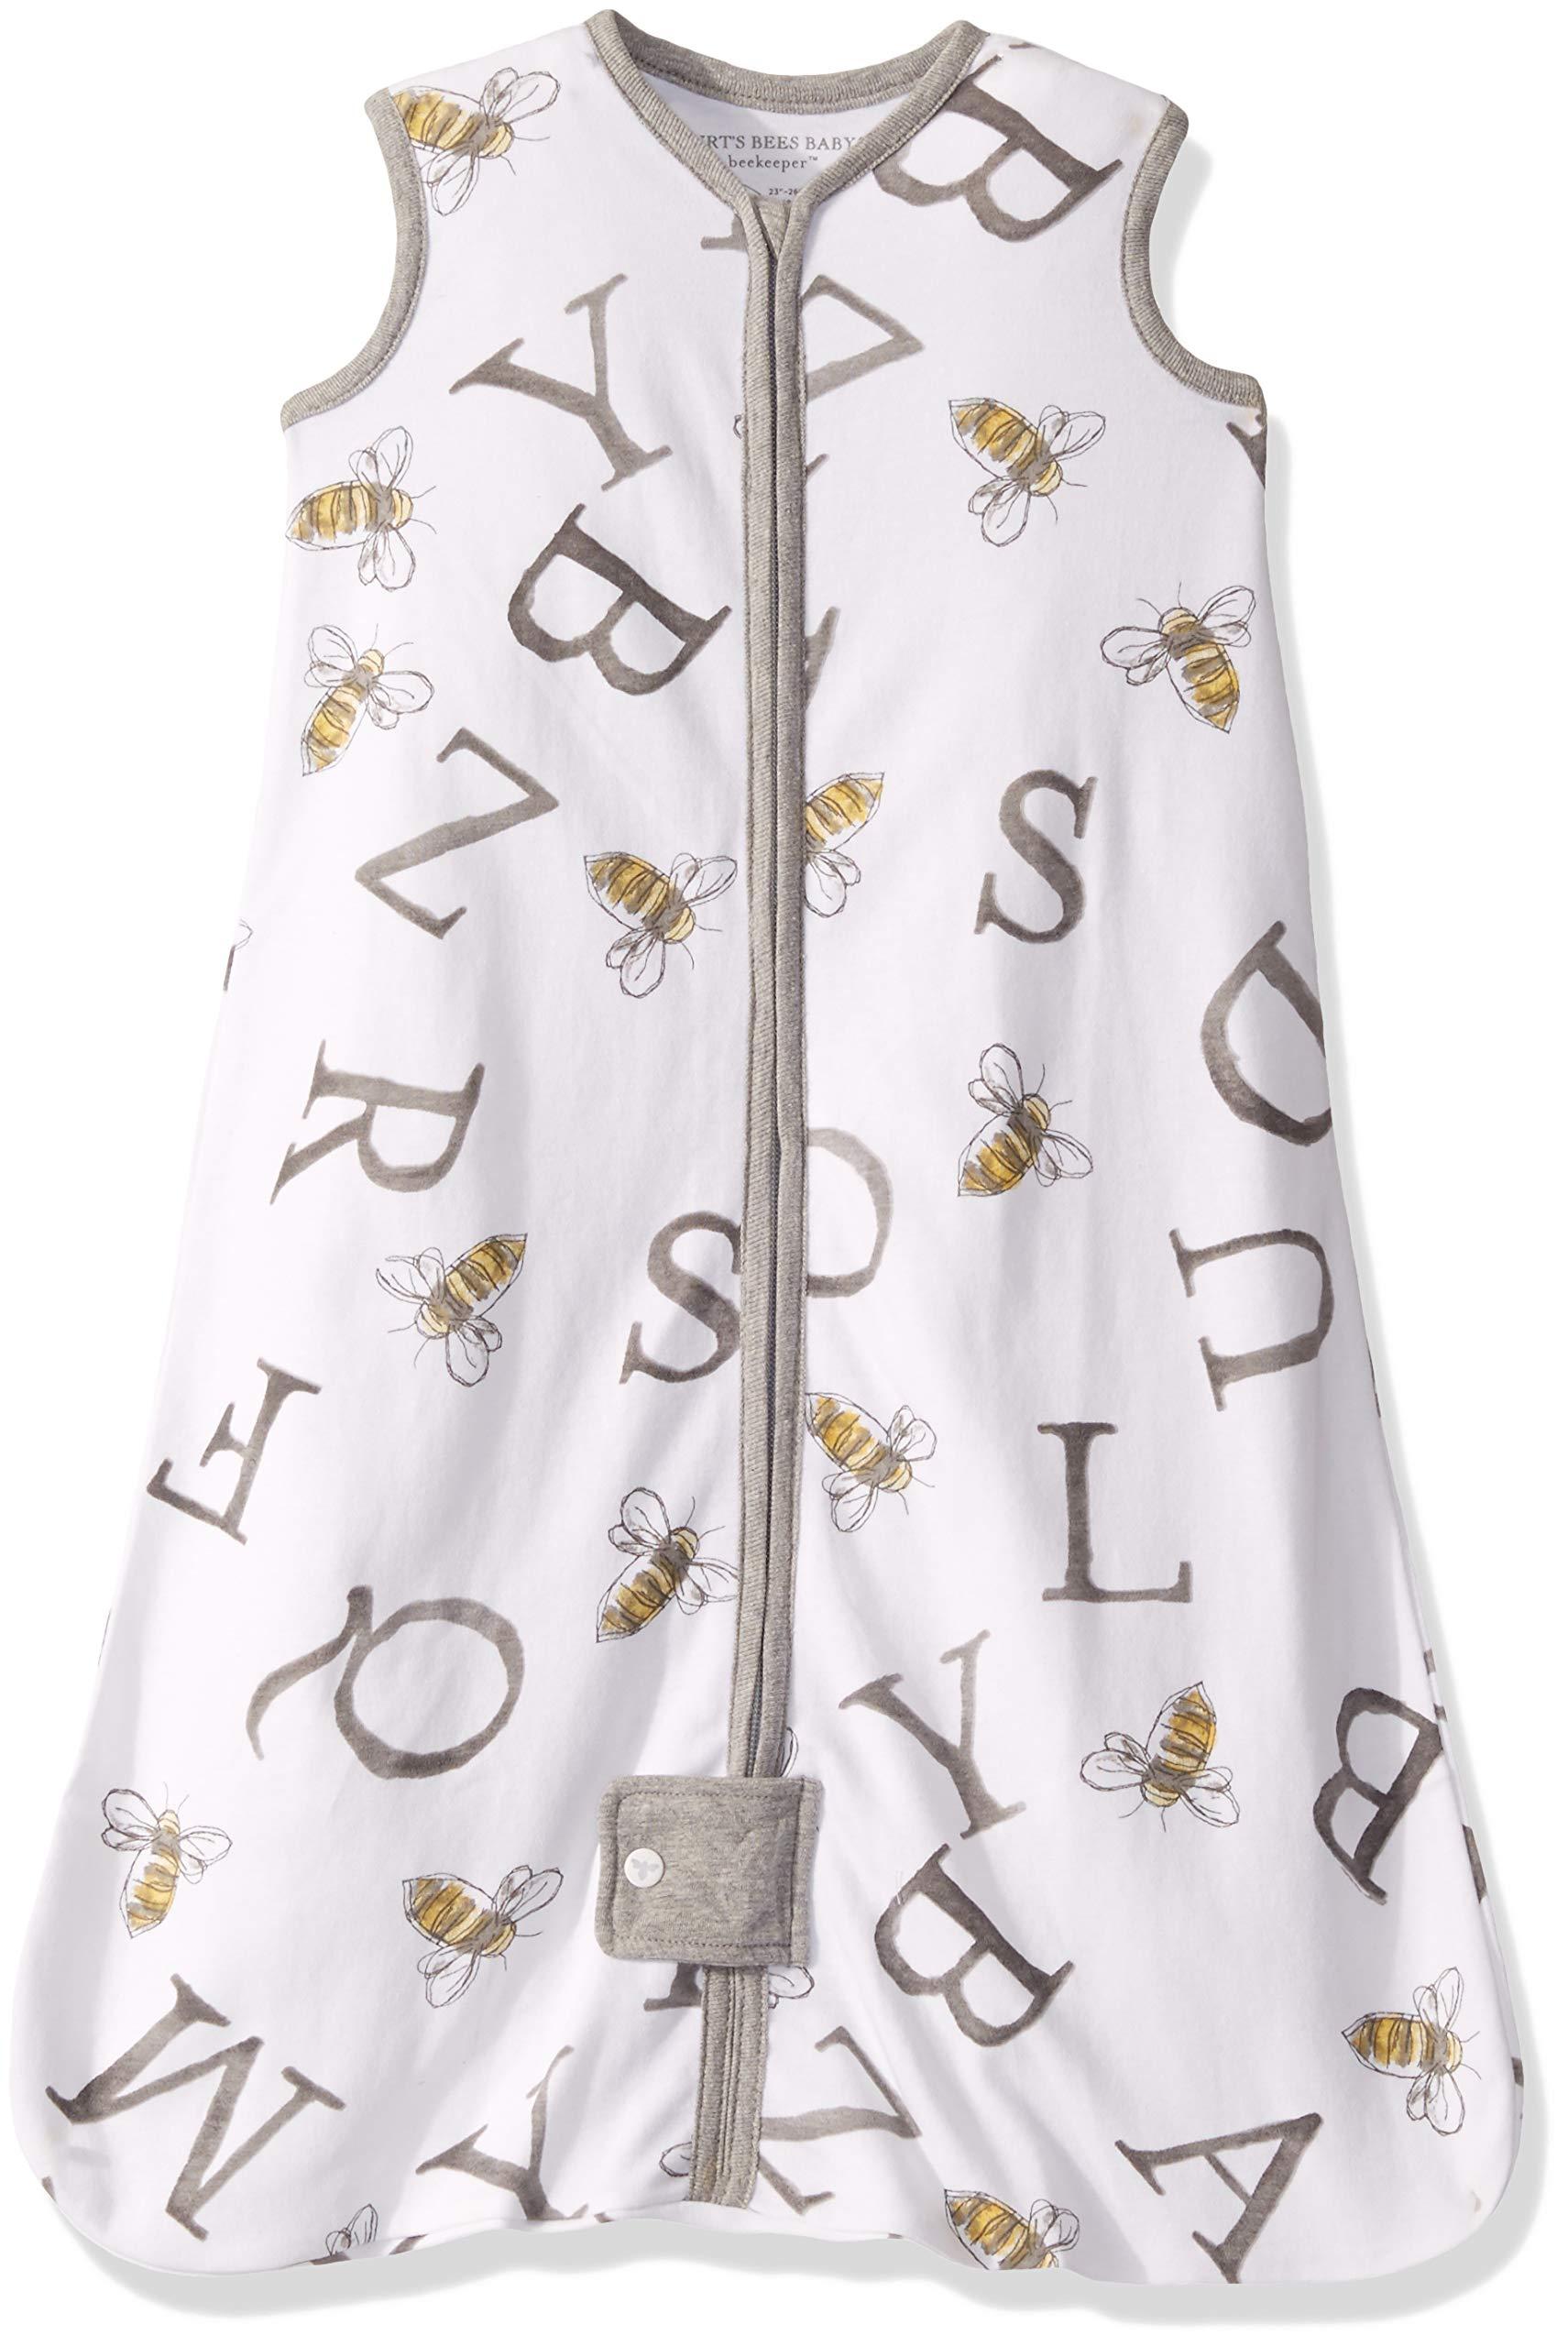 Burt's Bees Baby Baby Unisex Pajamas, Zip-Front Non-Slip Footed Sleeper Pjs, Organic Cotton